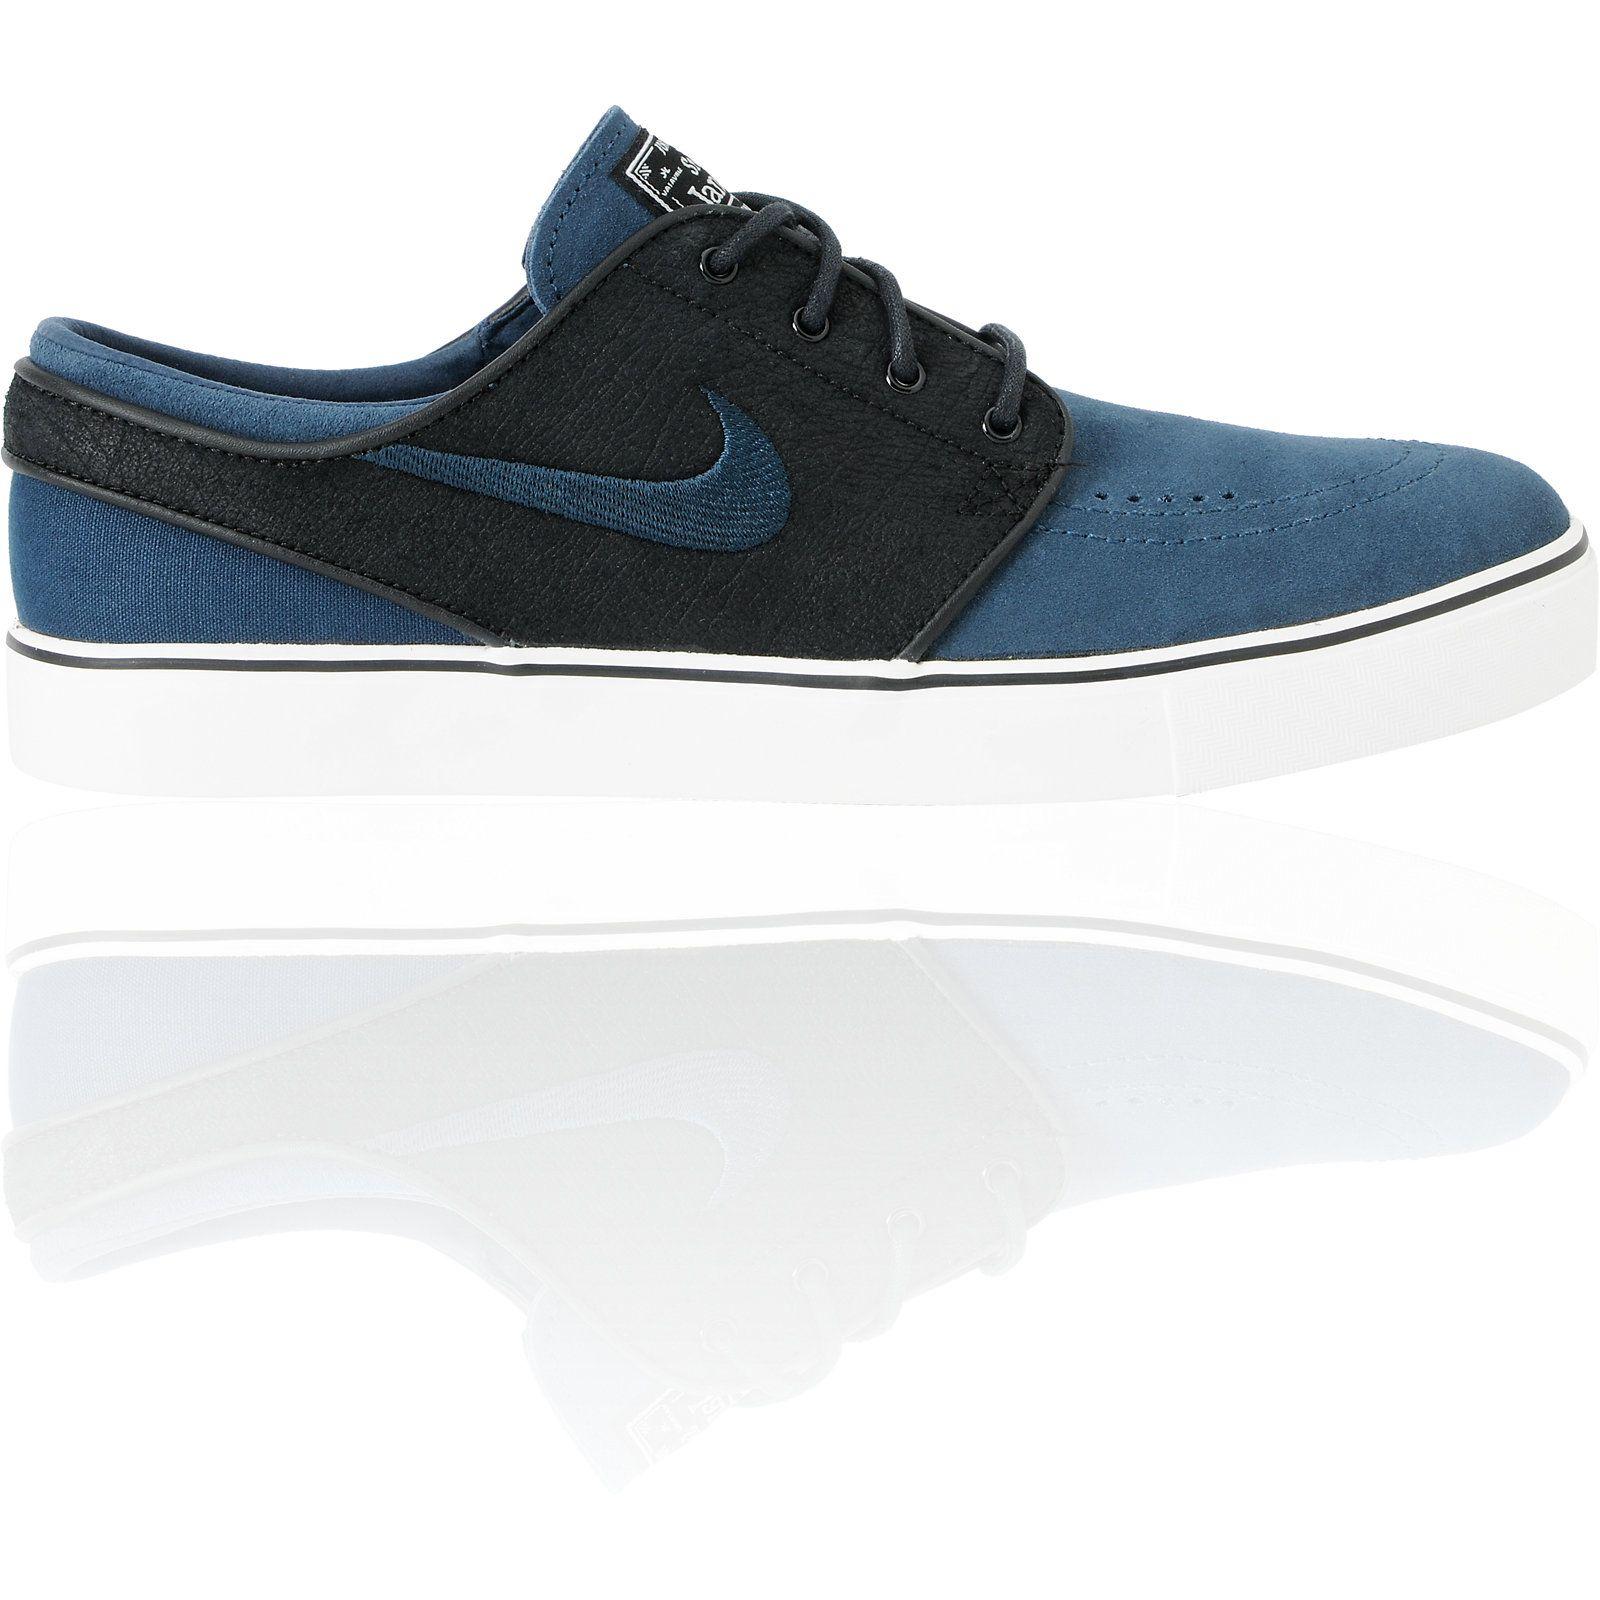 Adidas skate shoes zumiez - Nike Sb Zoom Stefan Janoski Black Deep Ocean Shoe At Zumiez Pdp